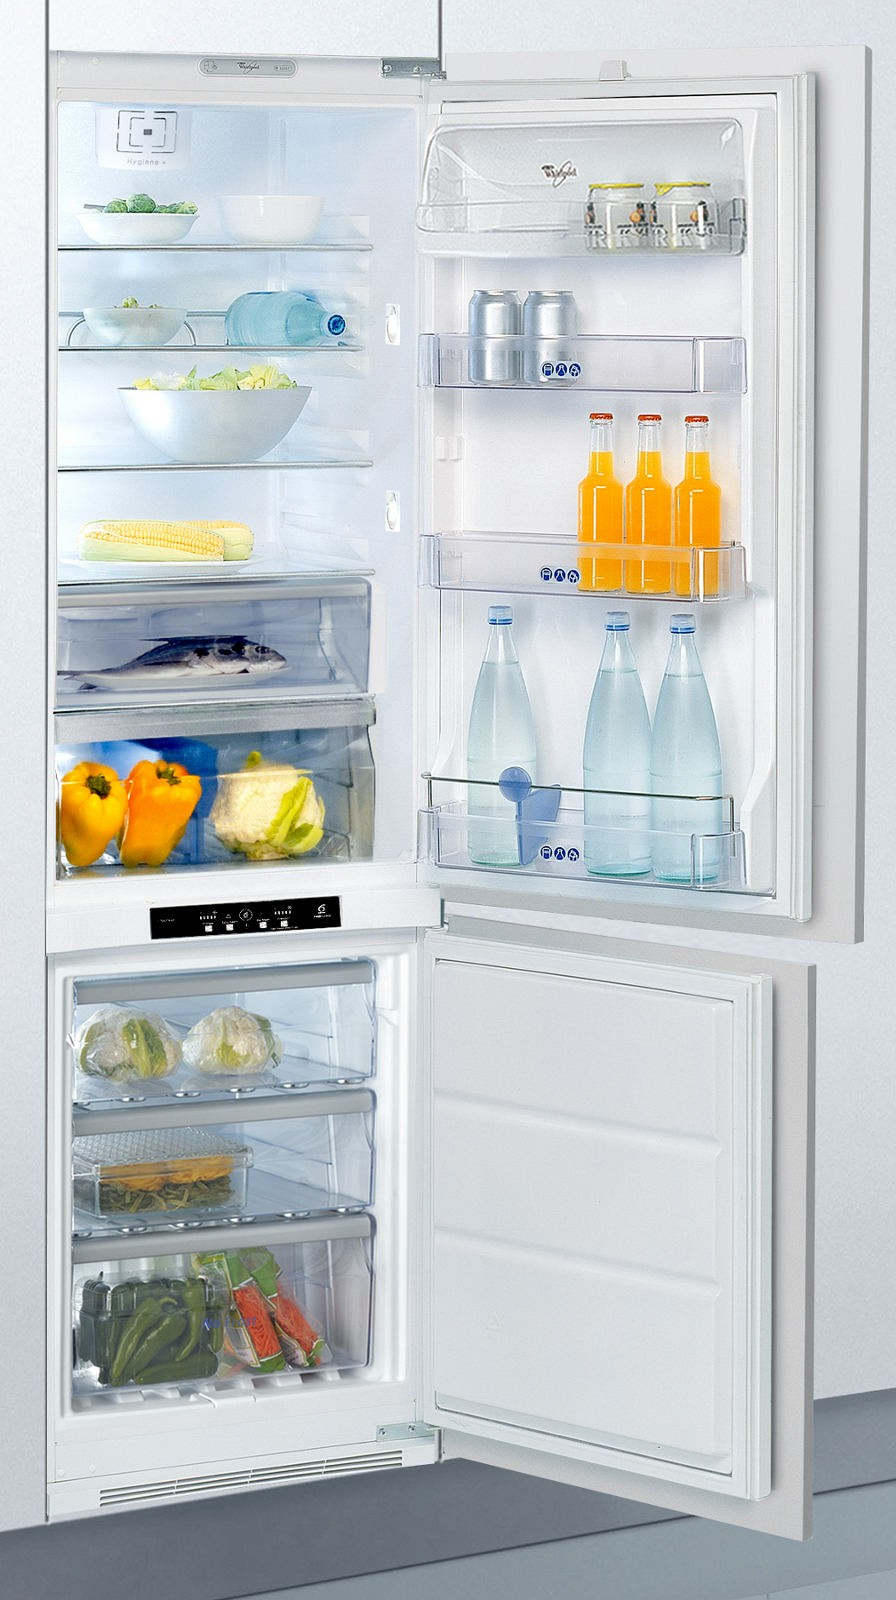 comparatif refrigerateur combine. Black Bedroom Furniture Sets. Home Design Ideas